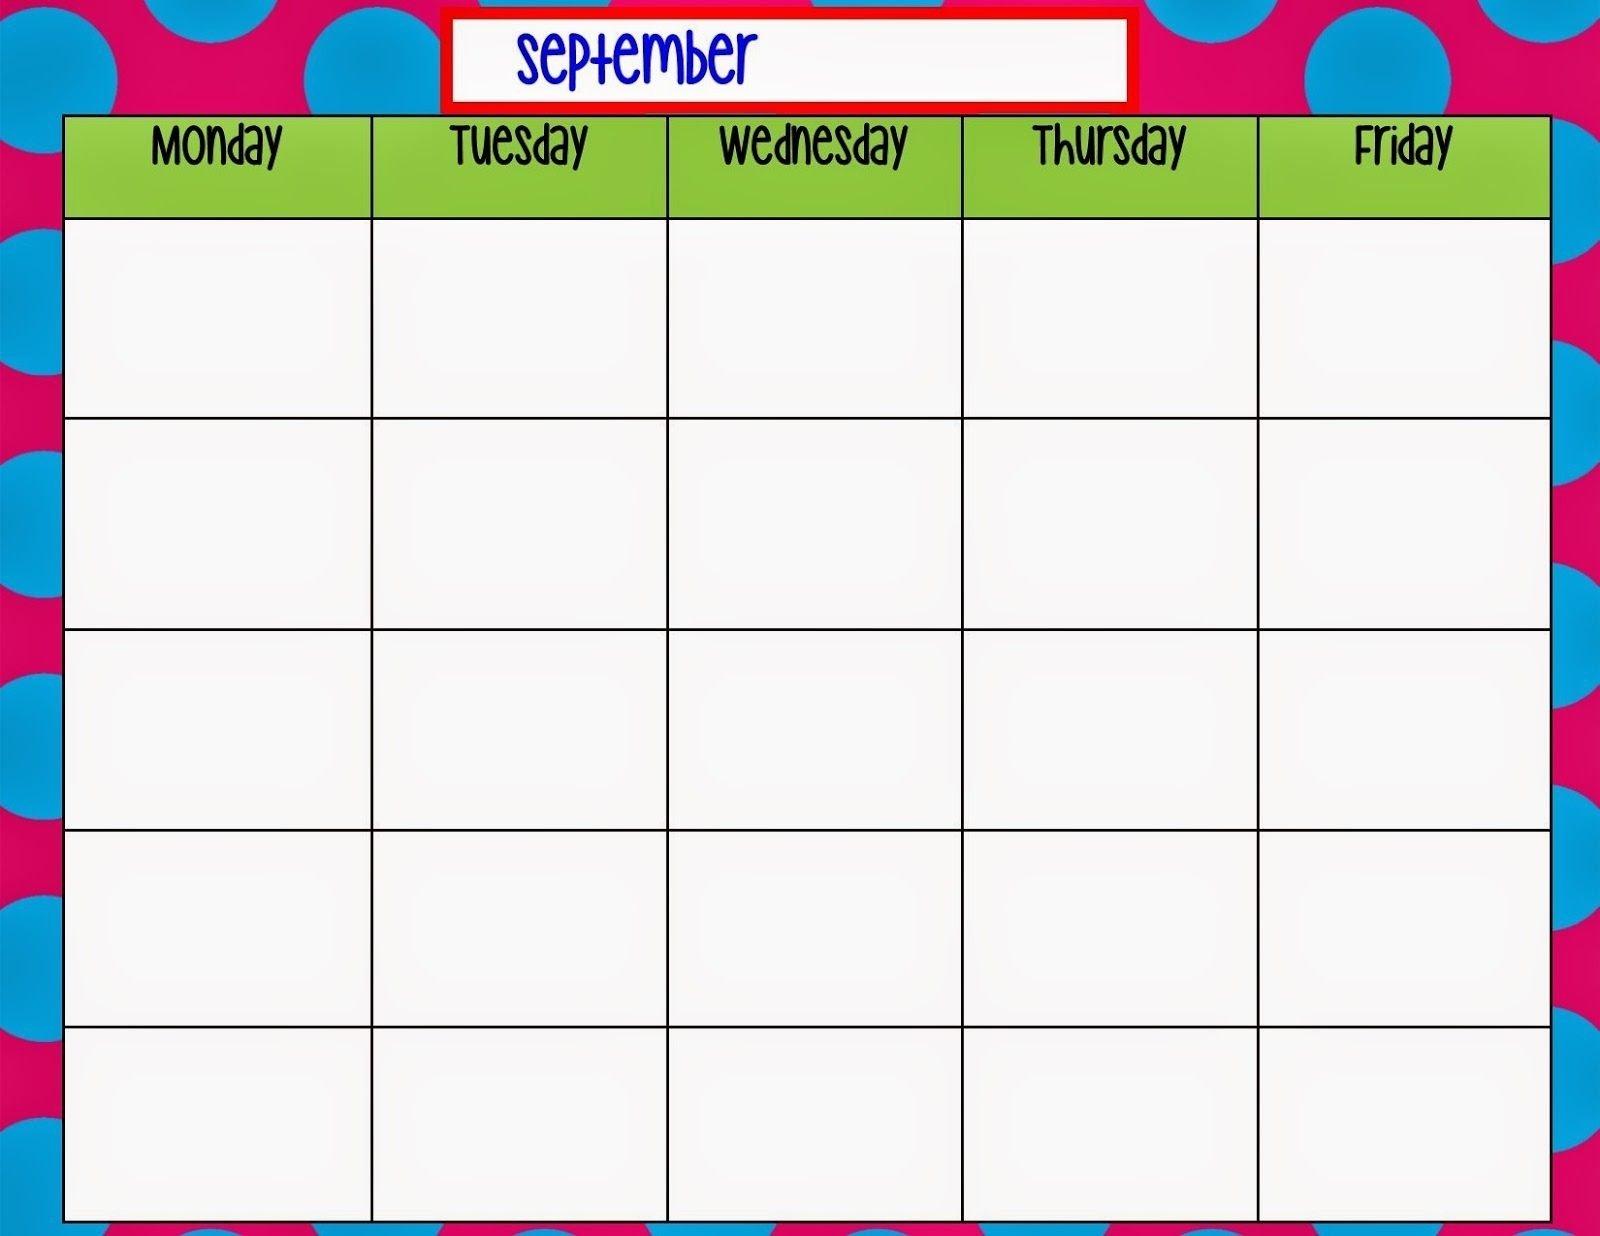 Monday To Friday Blank Calendar Template – Template Monday To Friday Calender Template